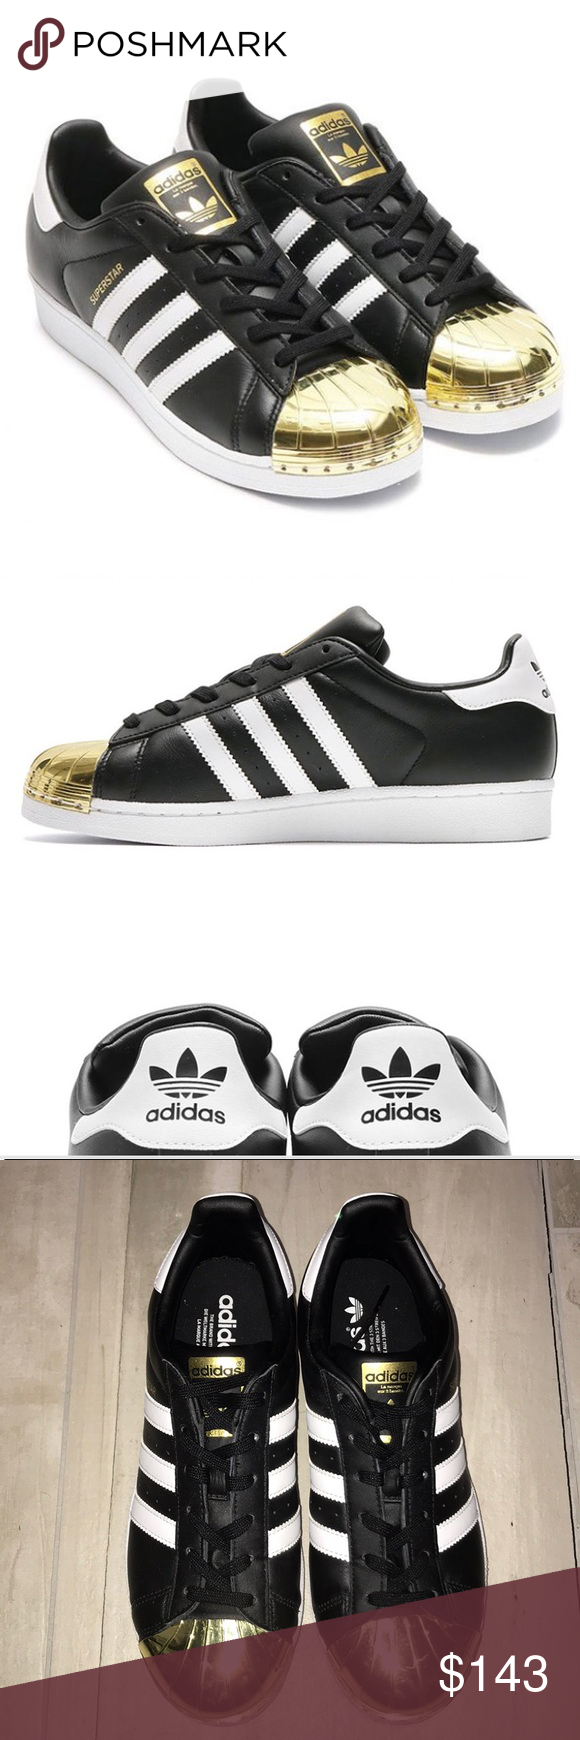 Adidas superstar Gold metal metallic toe 8 | Adidas